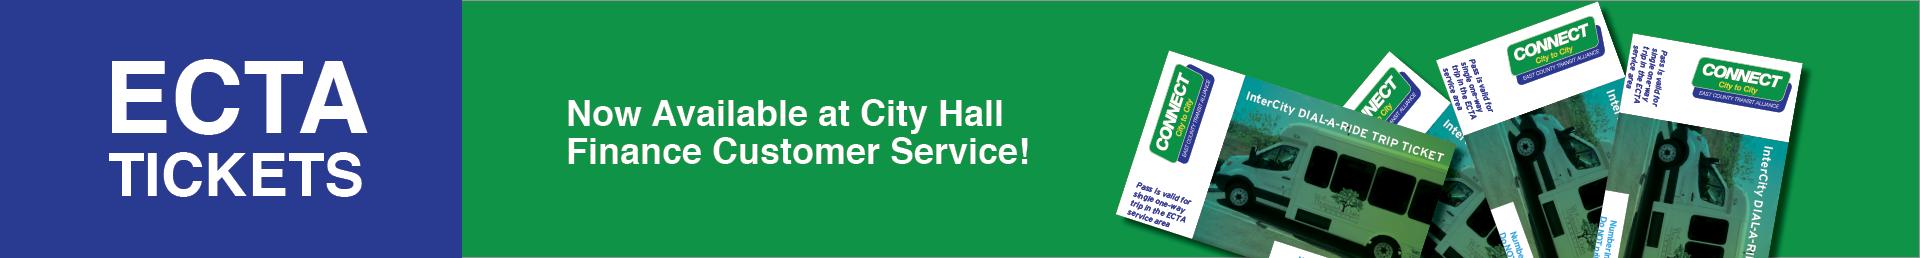 Thousand Oaks Transit ECTA Tickets Banner Image